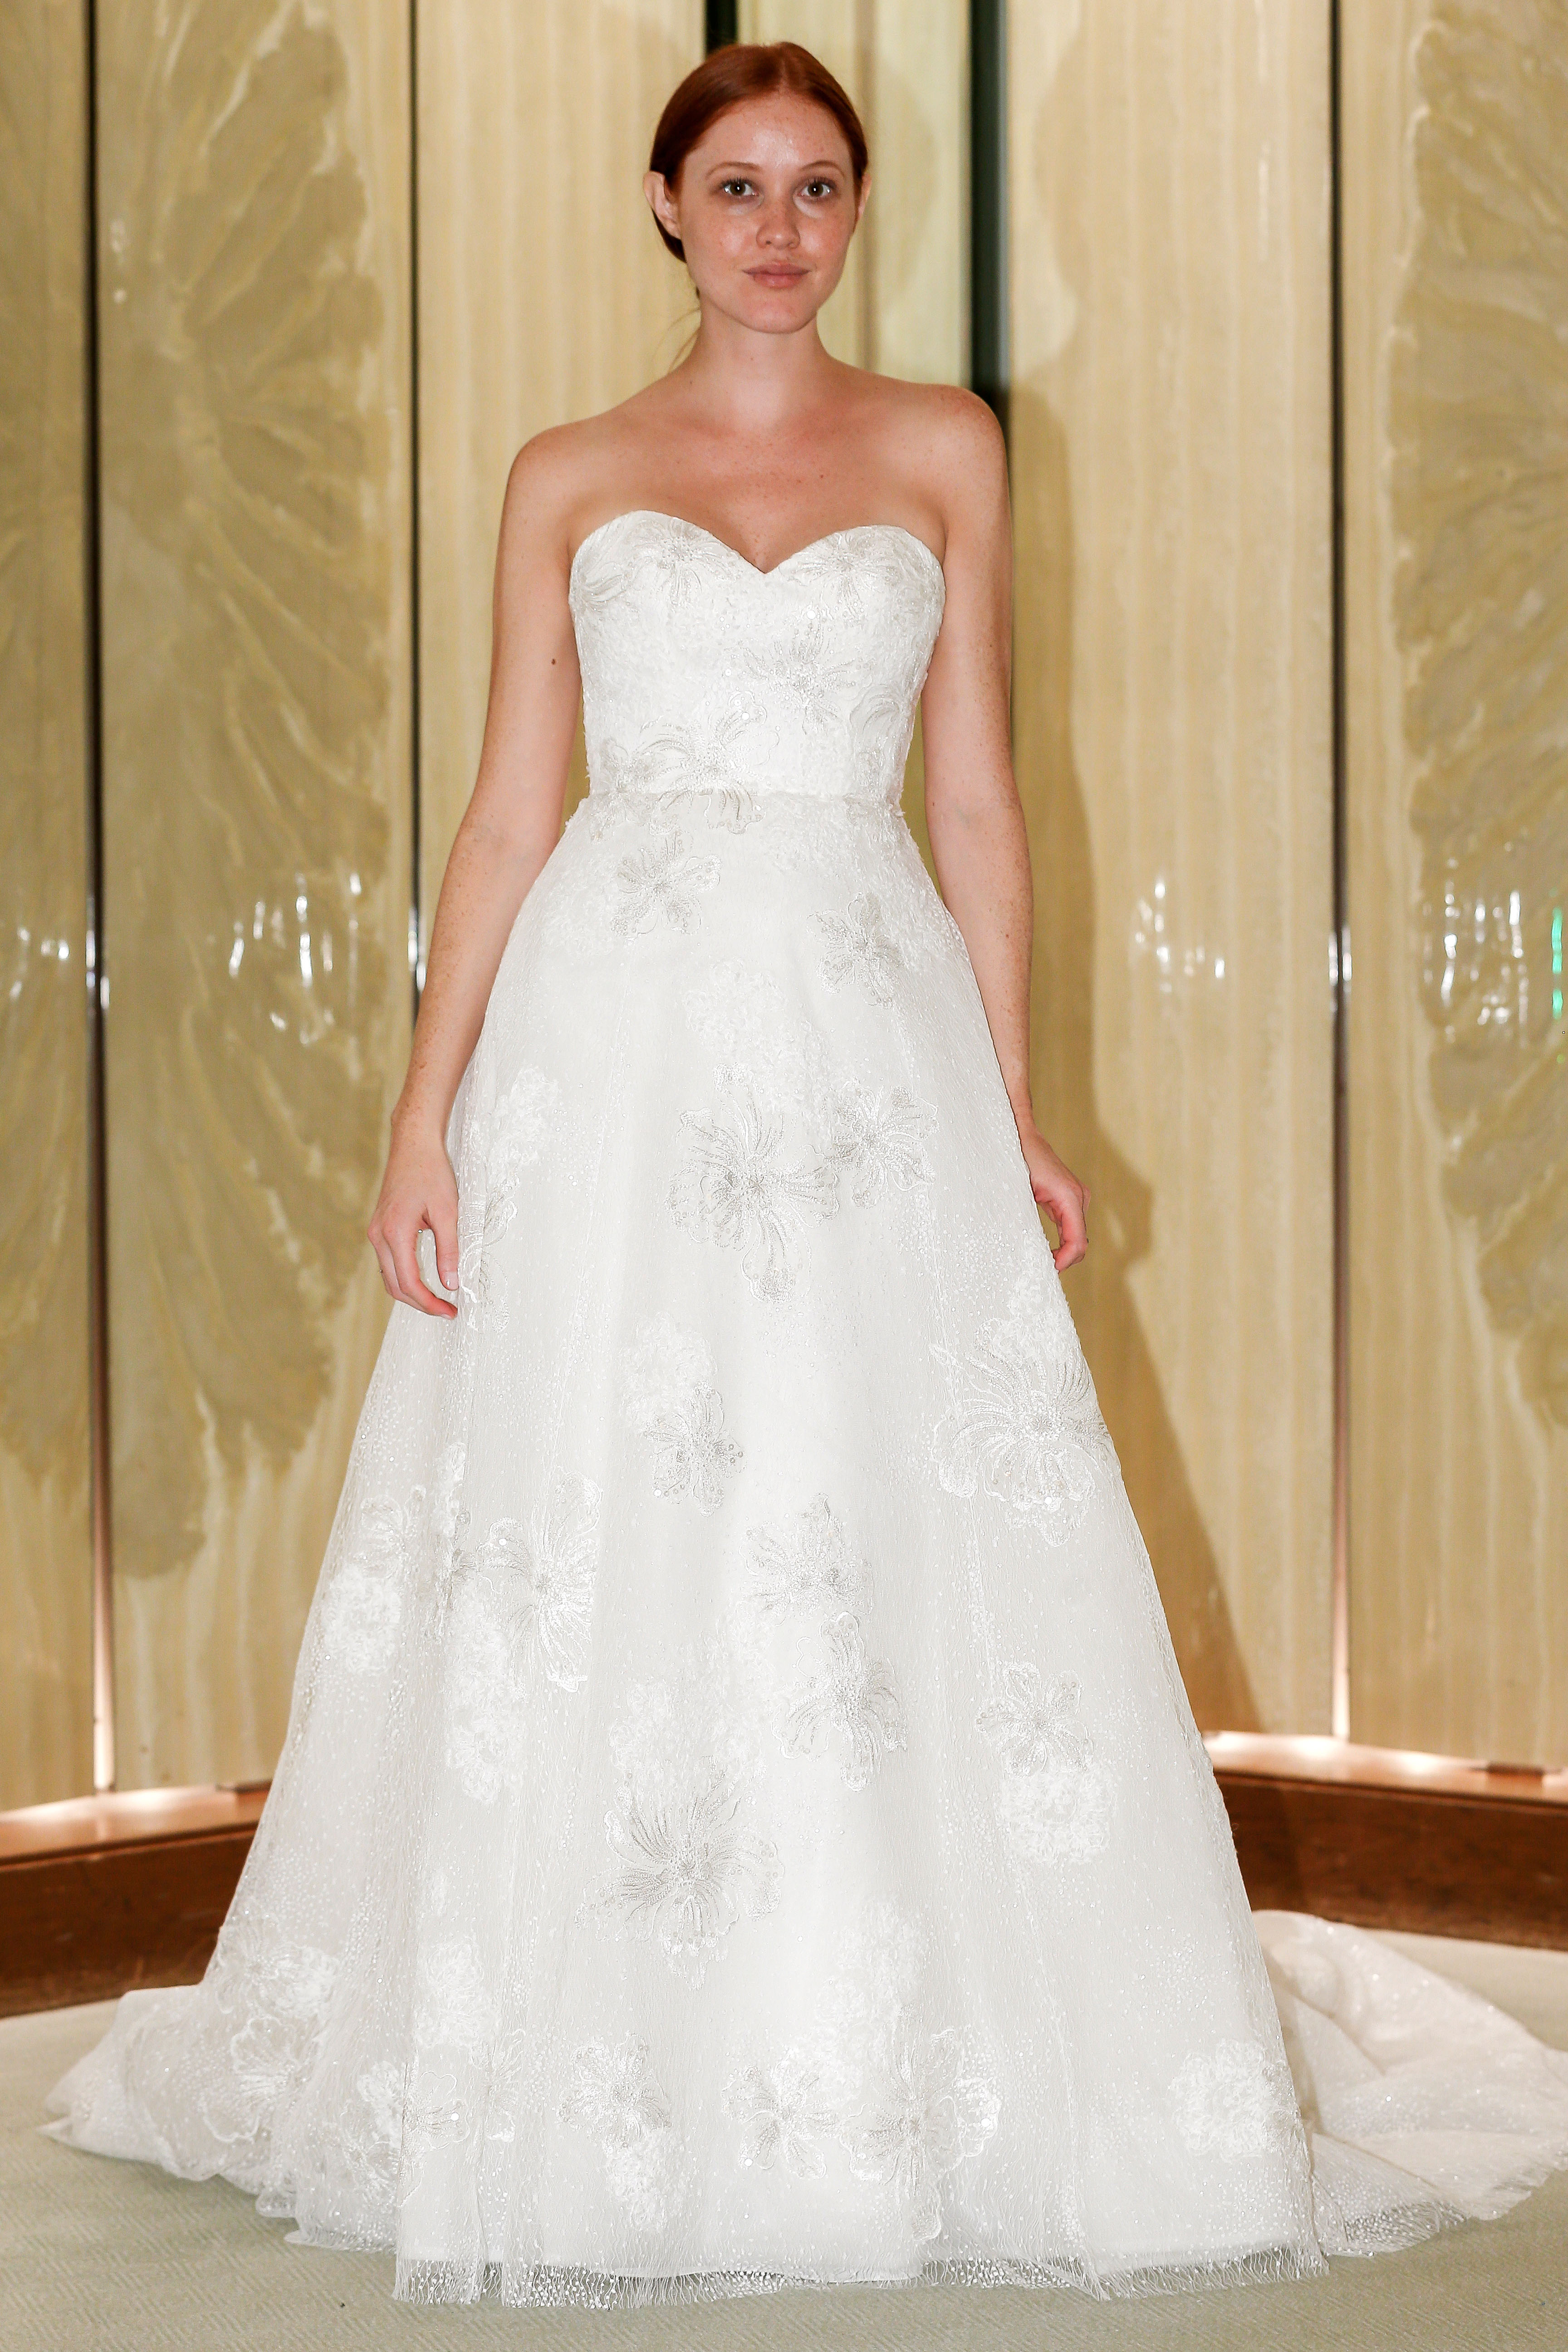 randy fenoli wedding dress sweetheart strapless a-line floral metallic